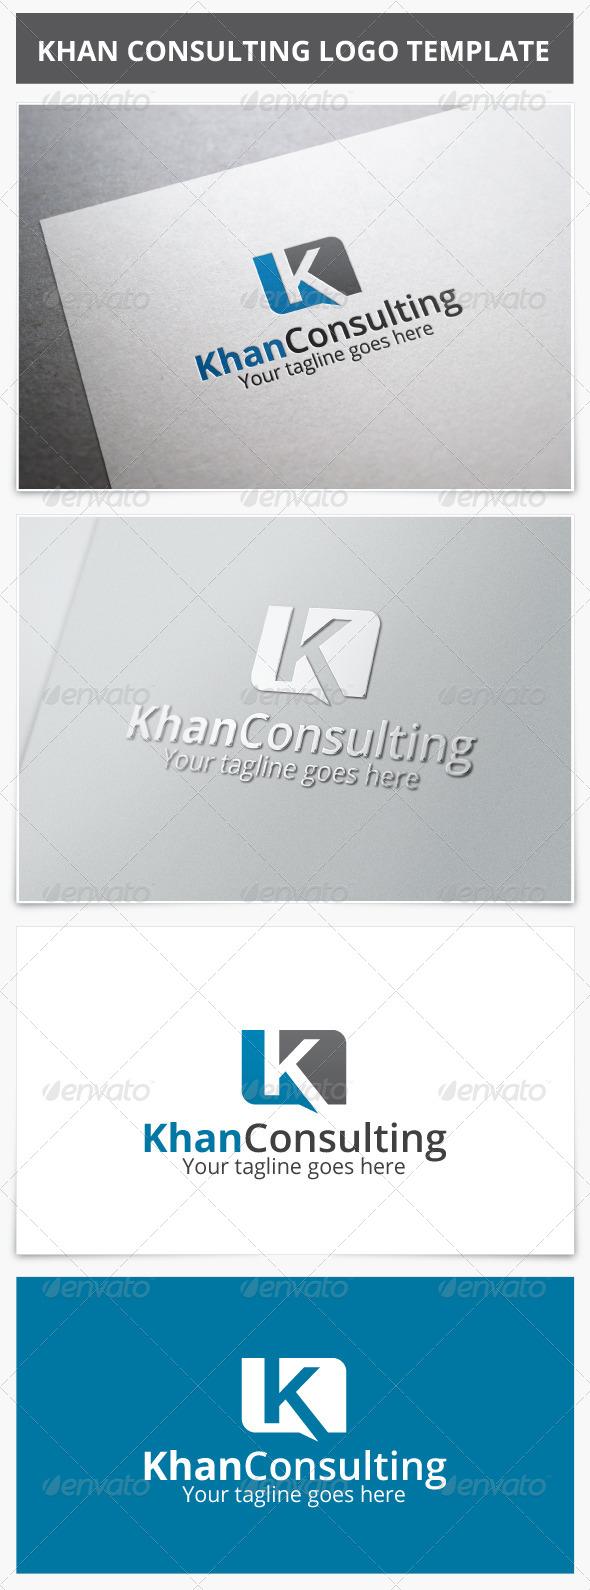 GraphicRiver Khan Consulting Logo 7061169